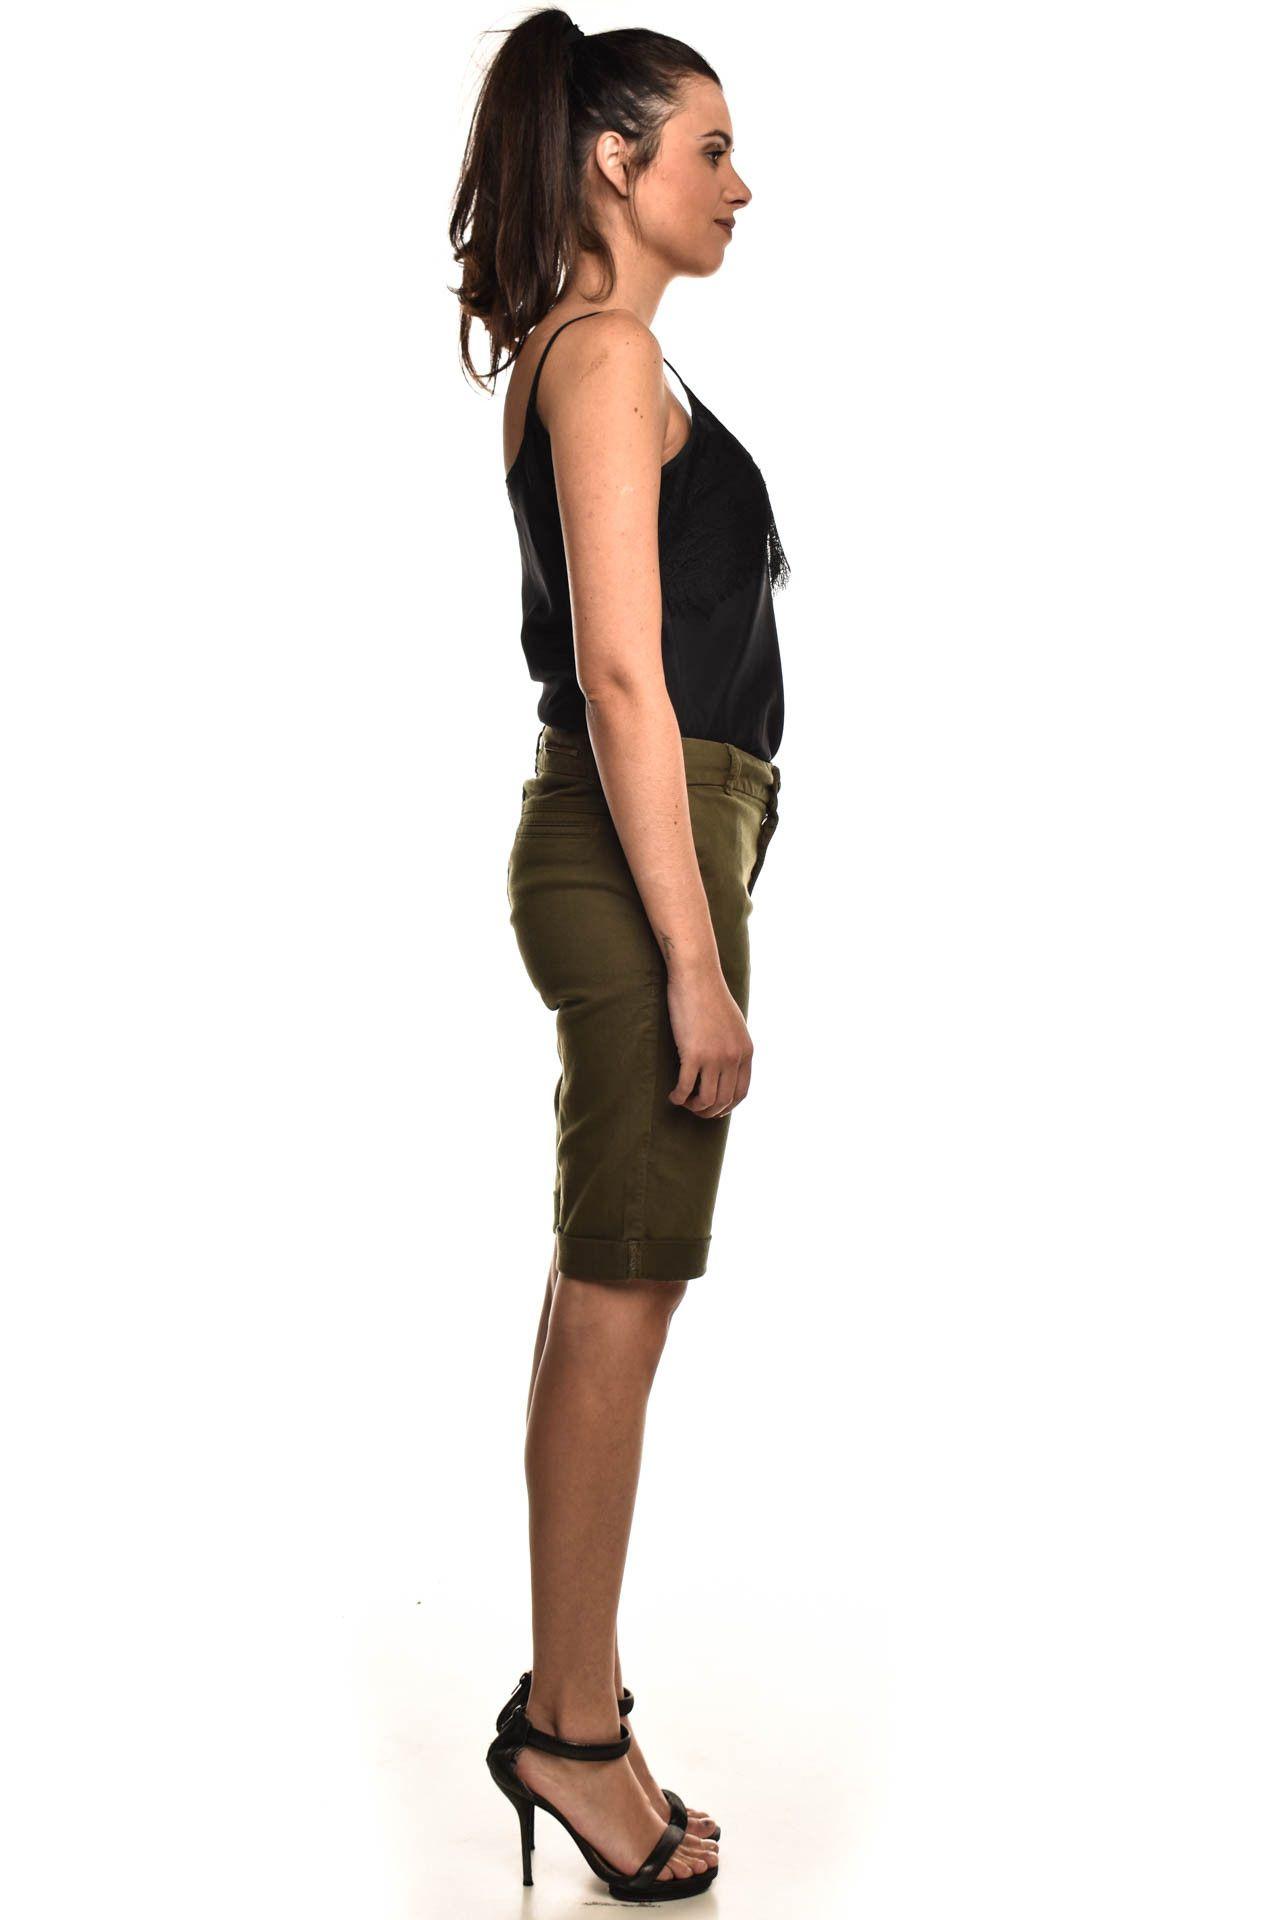 Maria Valentina - Bermuda Verde Militar - Foto 4